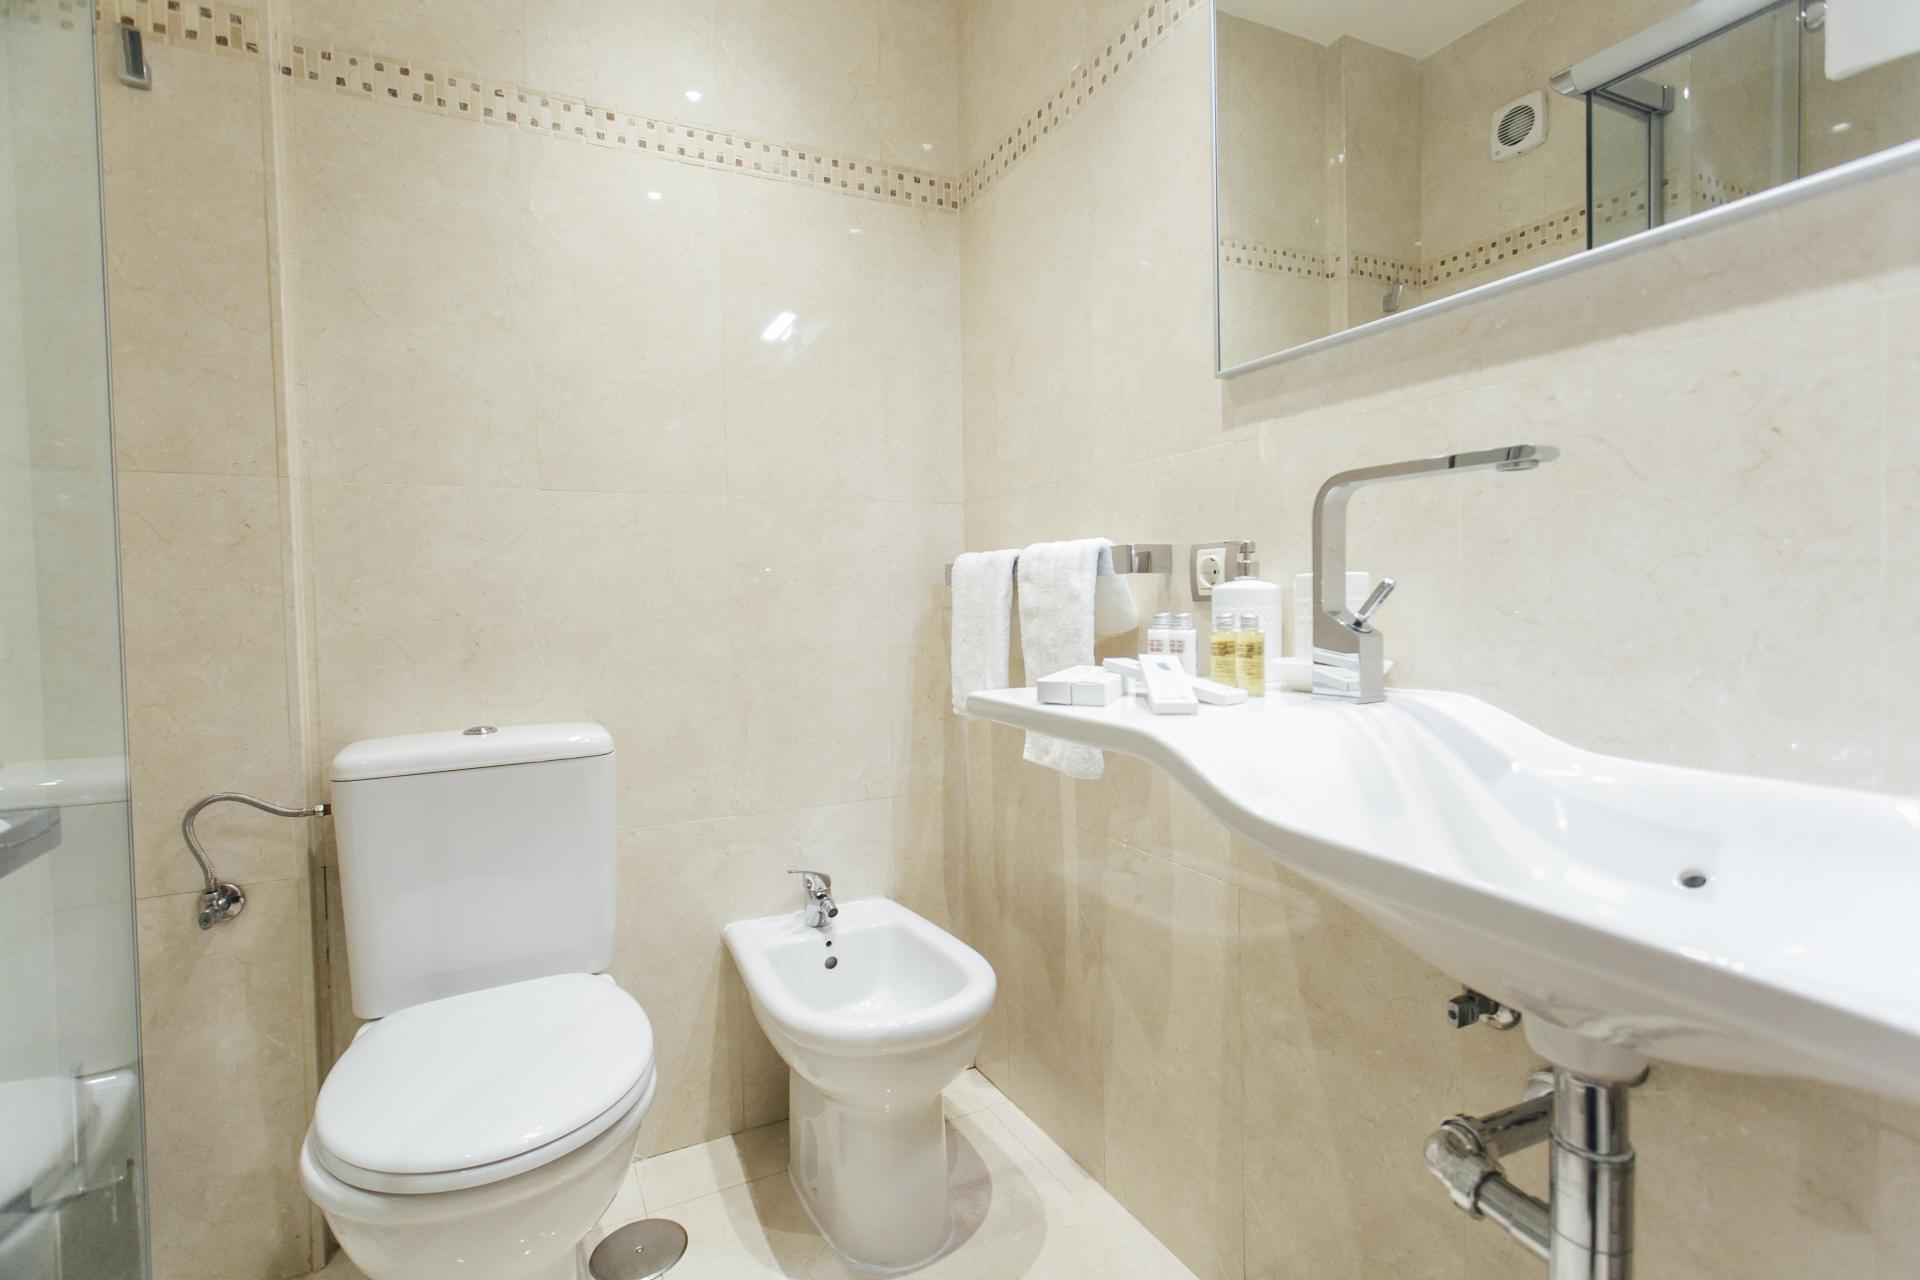 Toilet at Arjona Apartment, Centre, Seville